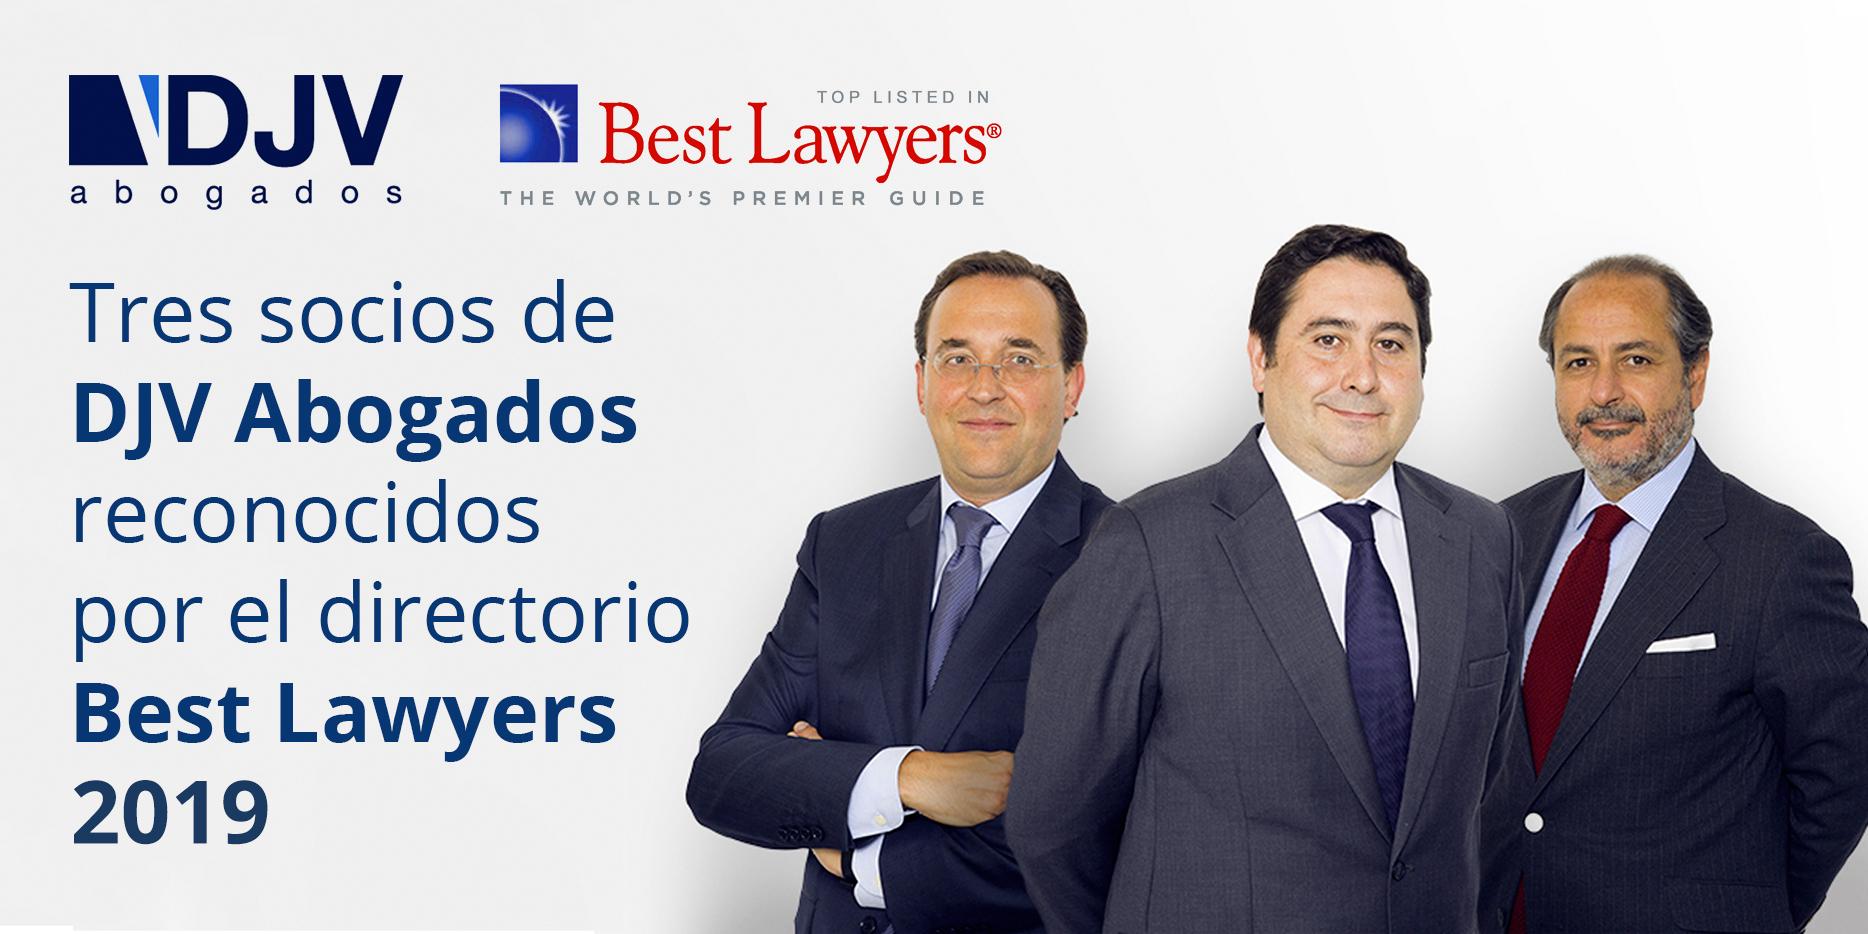 Djv Abogados Best Lawyers